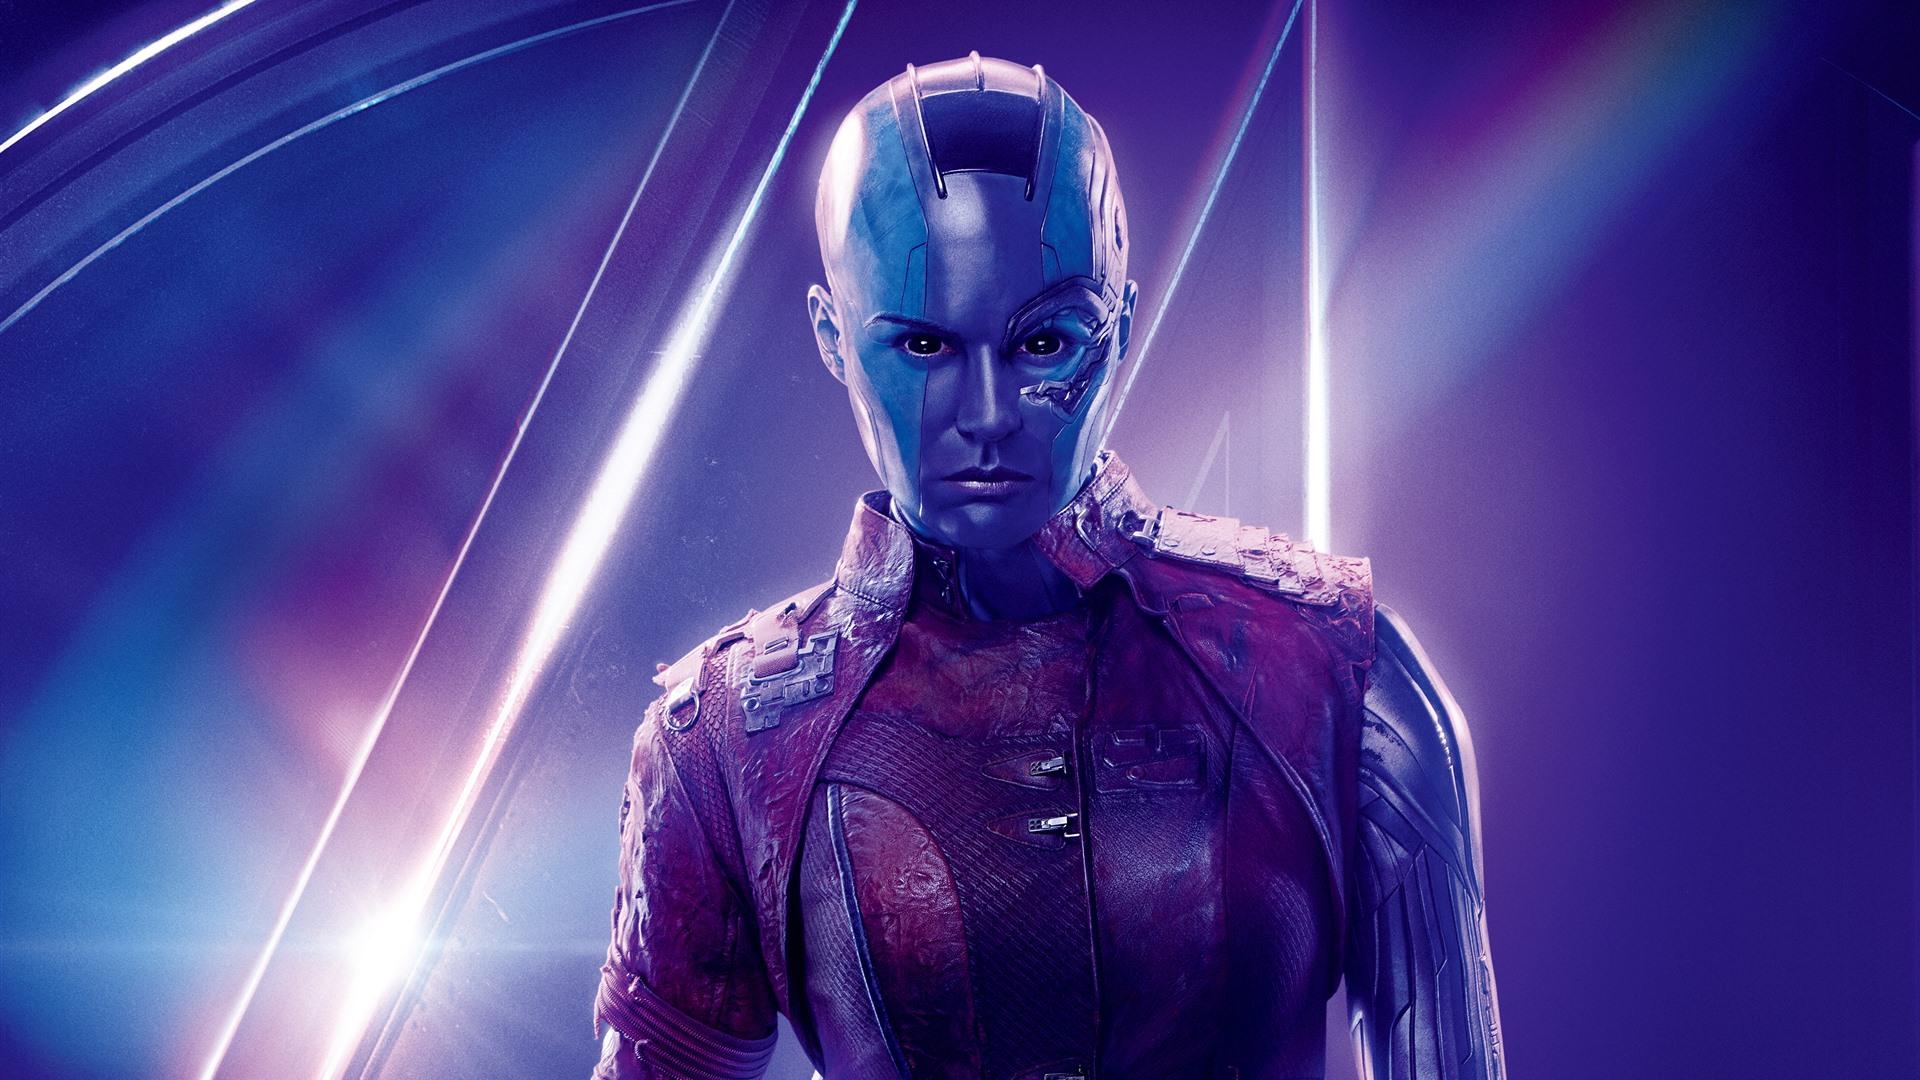 Wallpaper Nebula Avengers Infinity War 5120x2880 Uhd 5k Picture Image